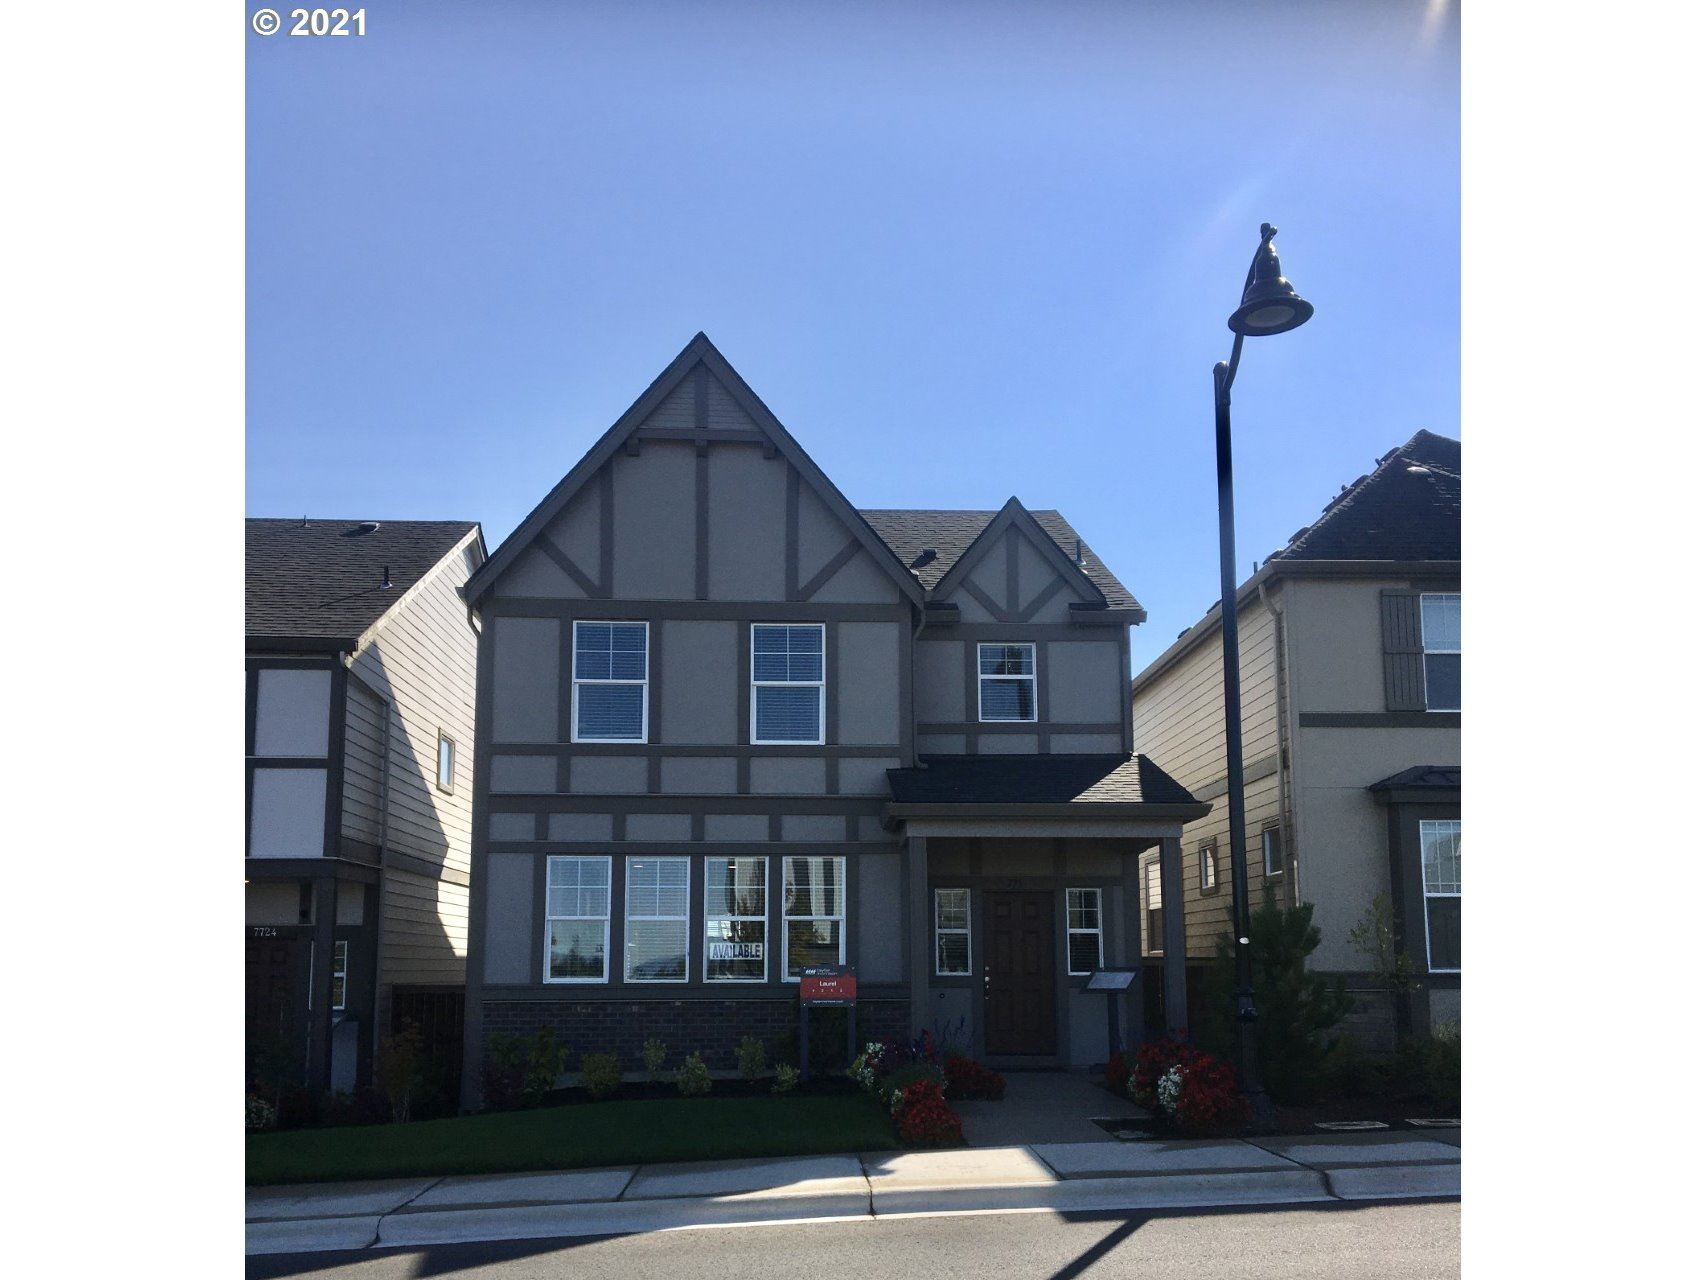 7716 NW KAISER RD, Portland, OR 97229 - MLS#: 21276783